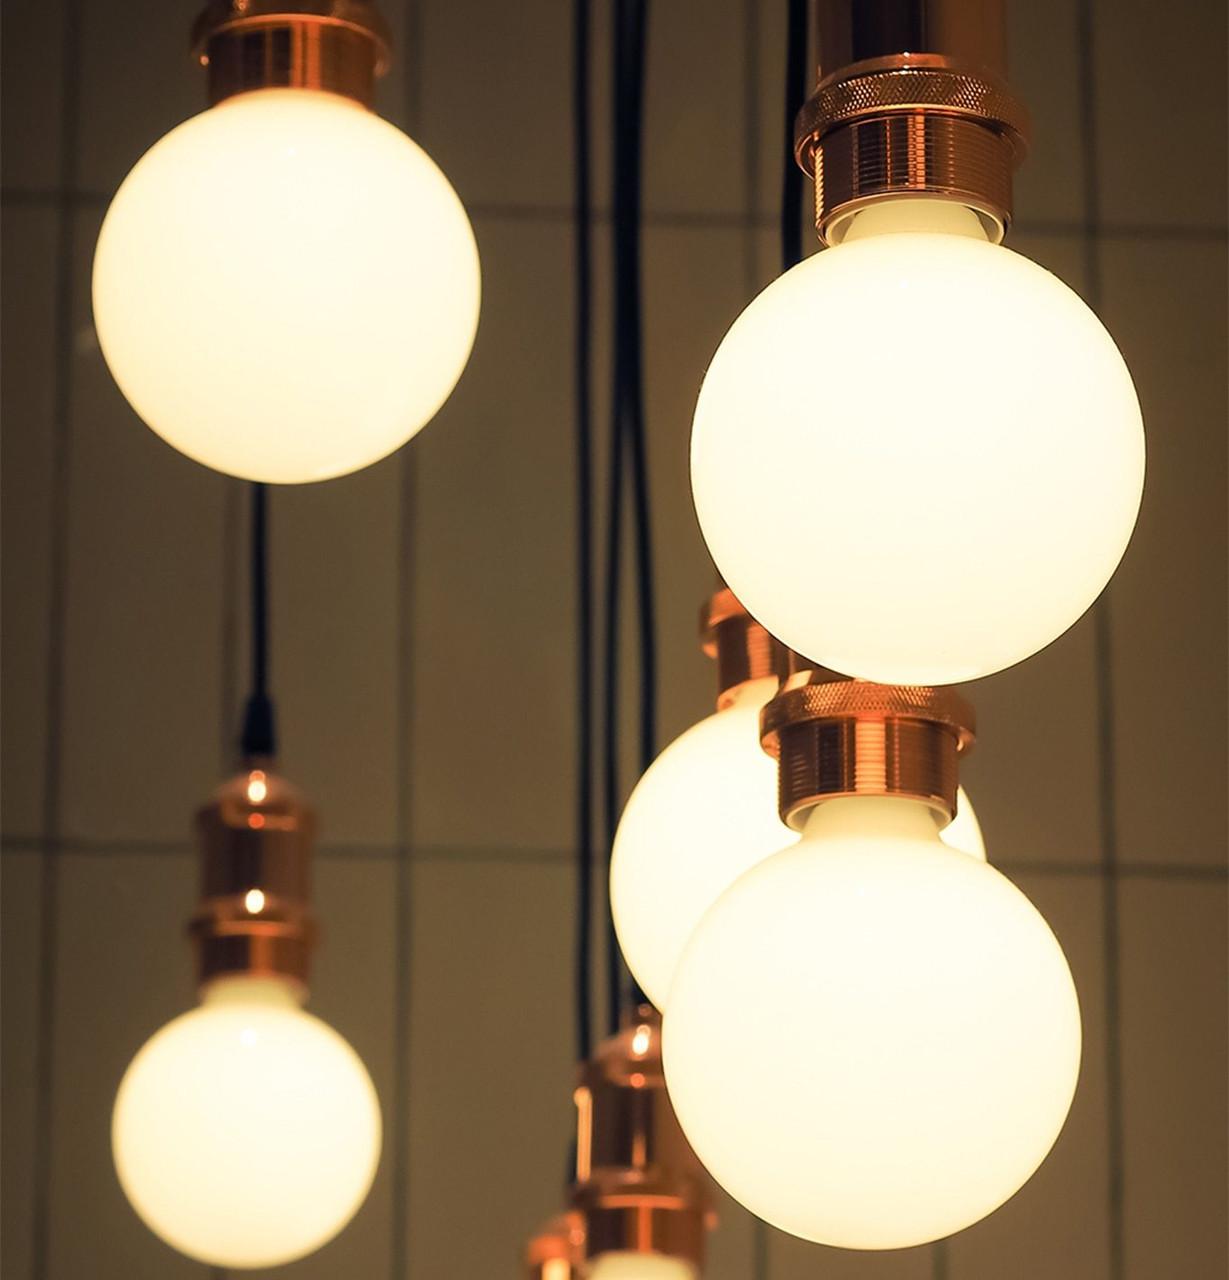 LED Dimmable Globe 2200K Light Bulbs